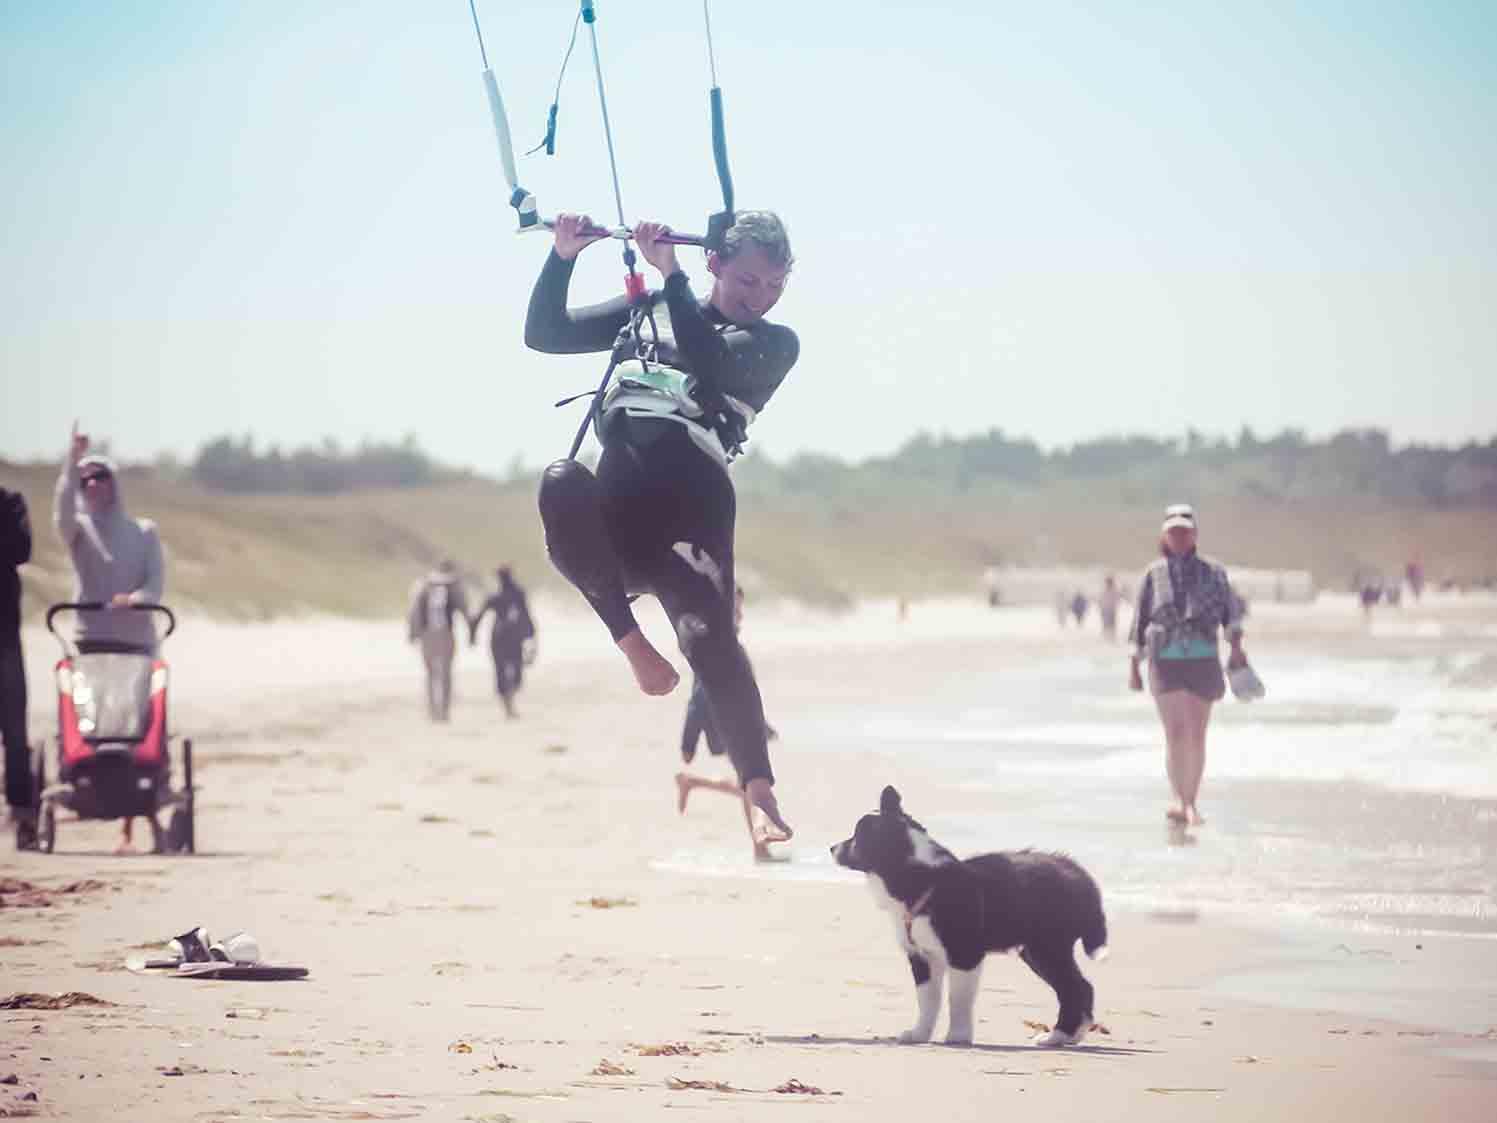 Kiten Ostsee Hund